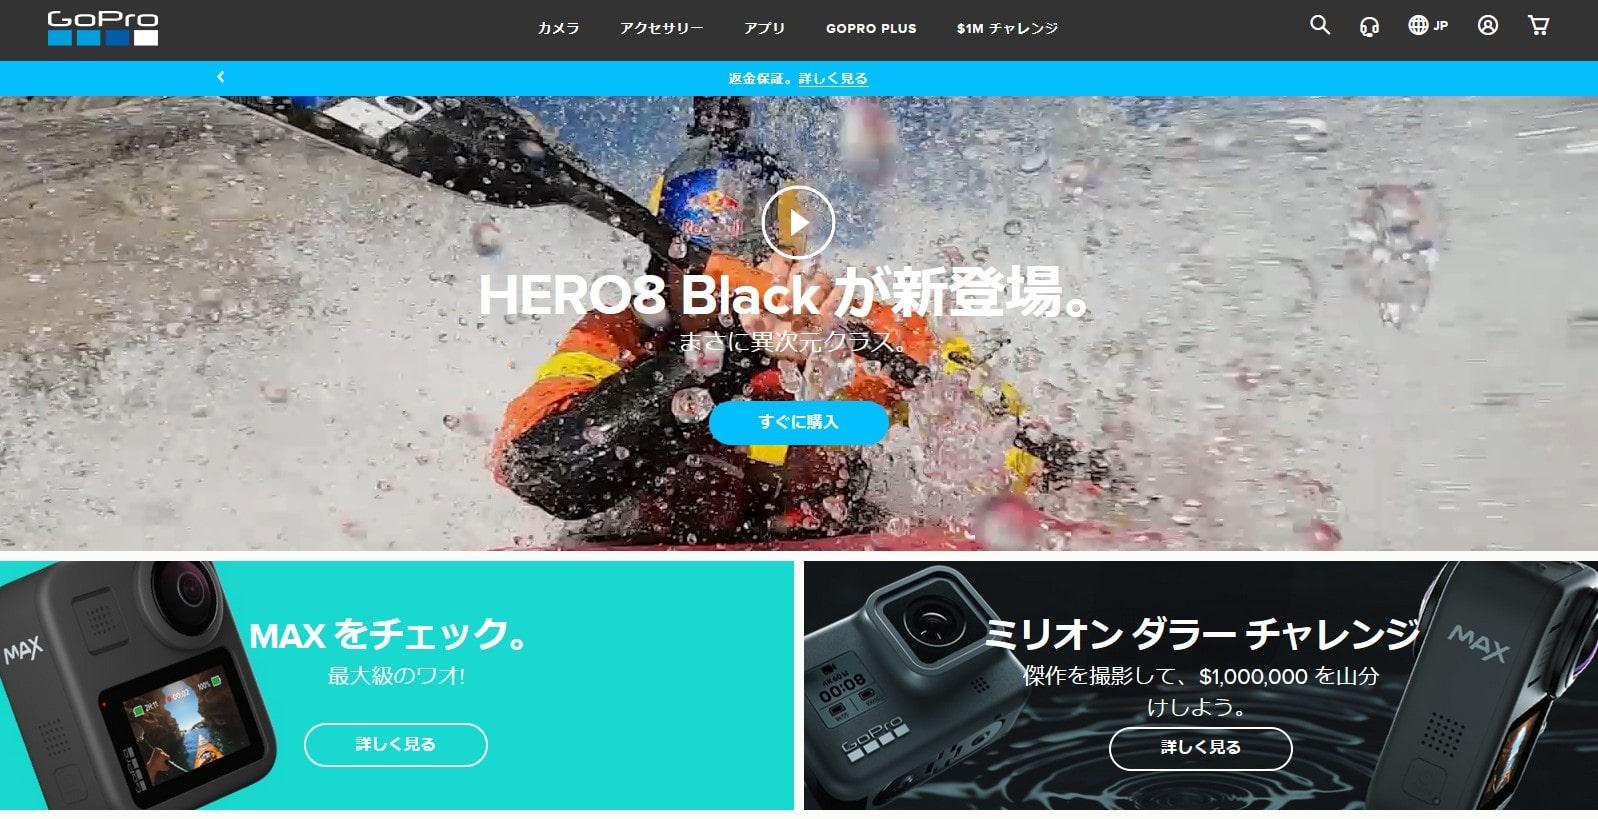 GoPro8予約公式サイト